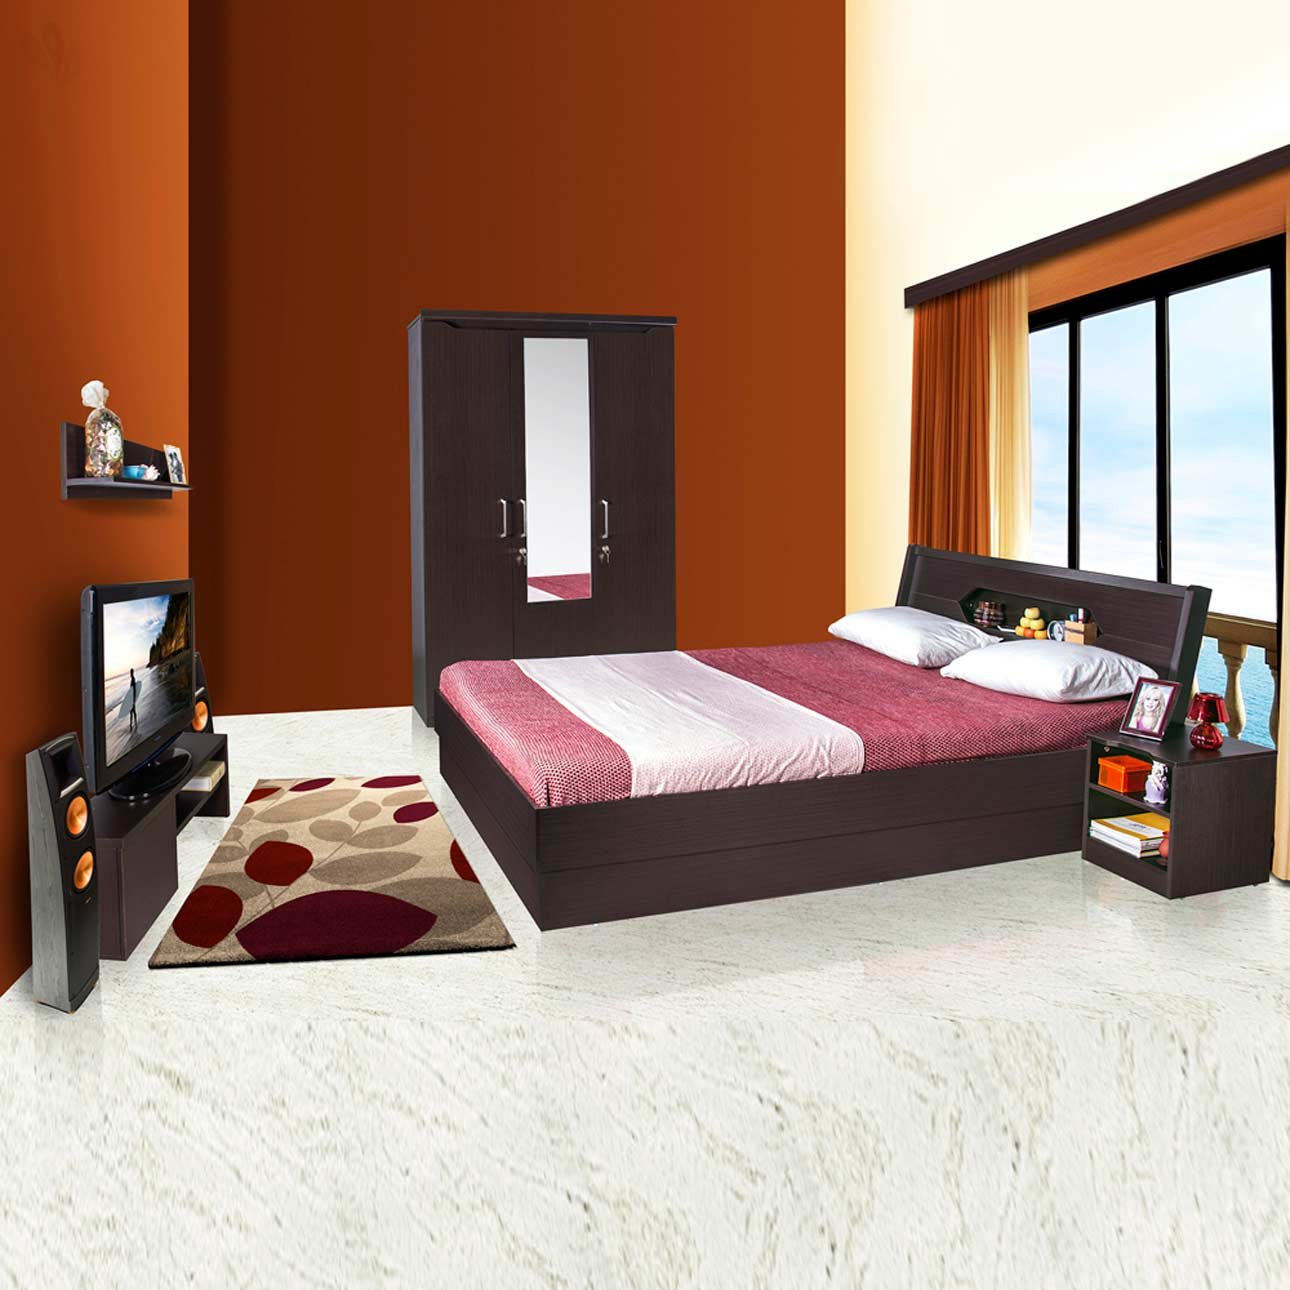 80 King Bedroom Set Decor Best HD